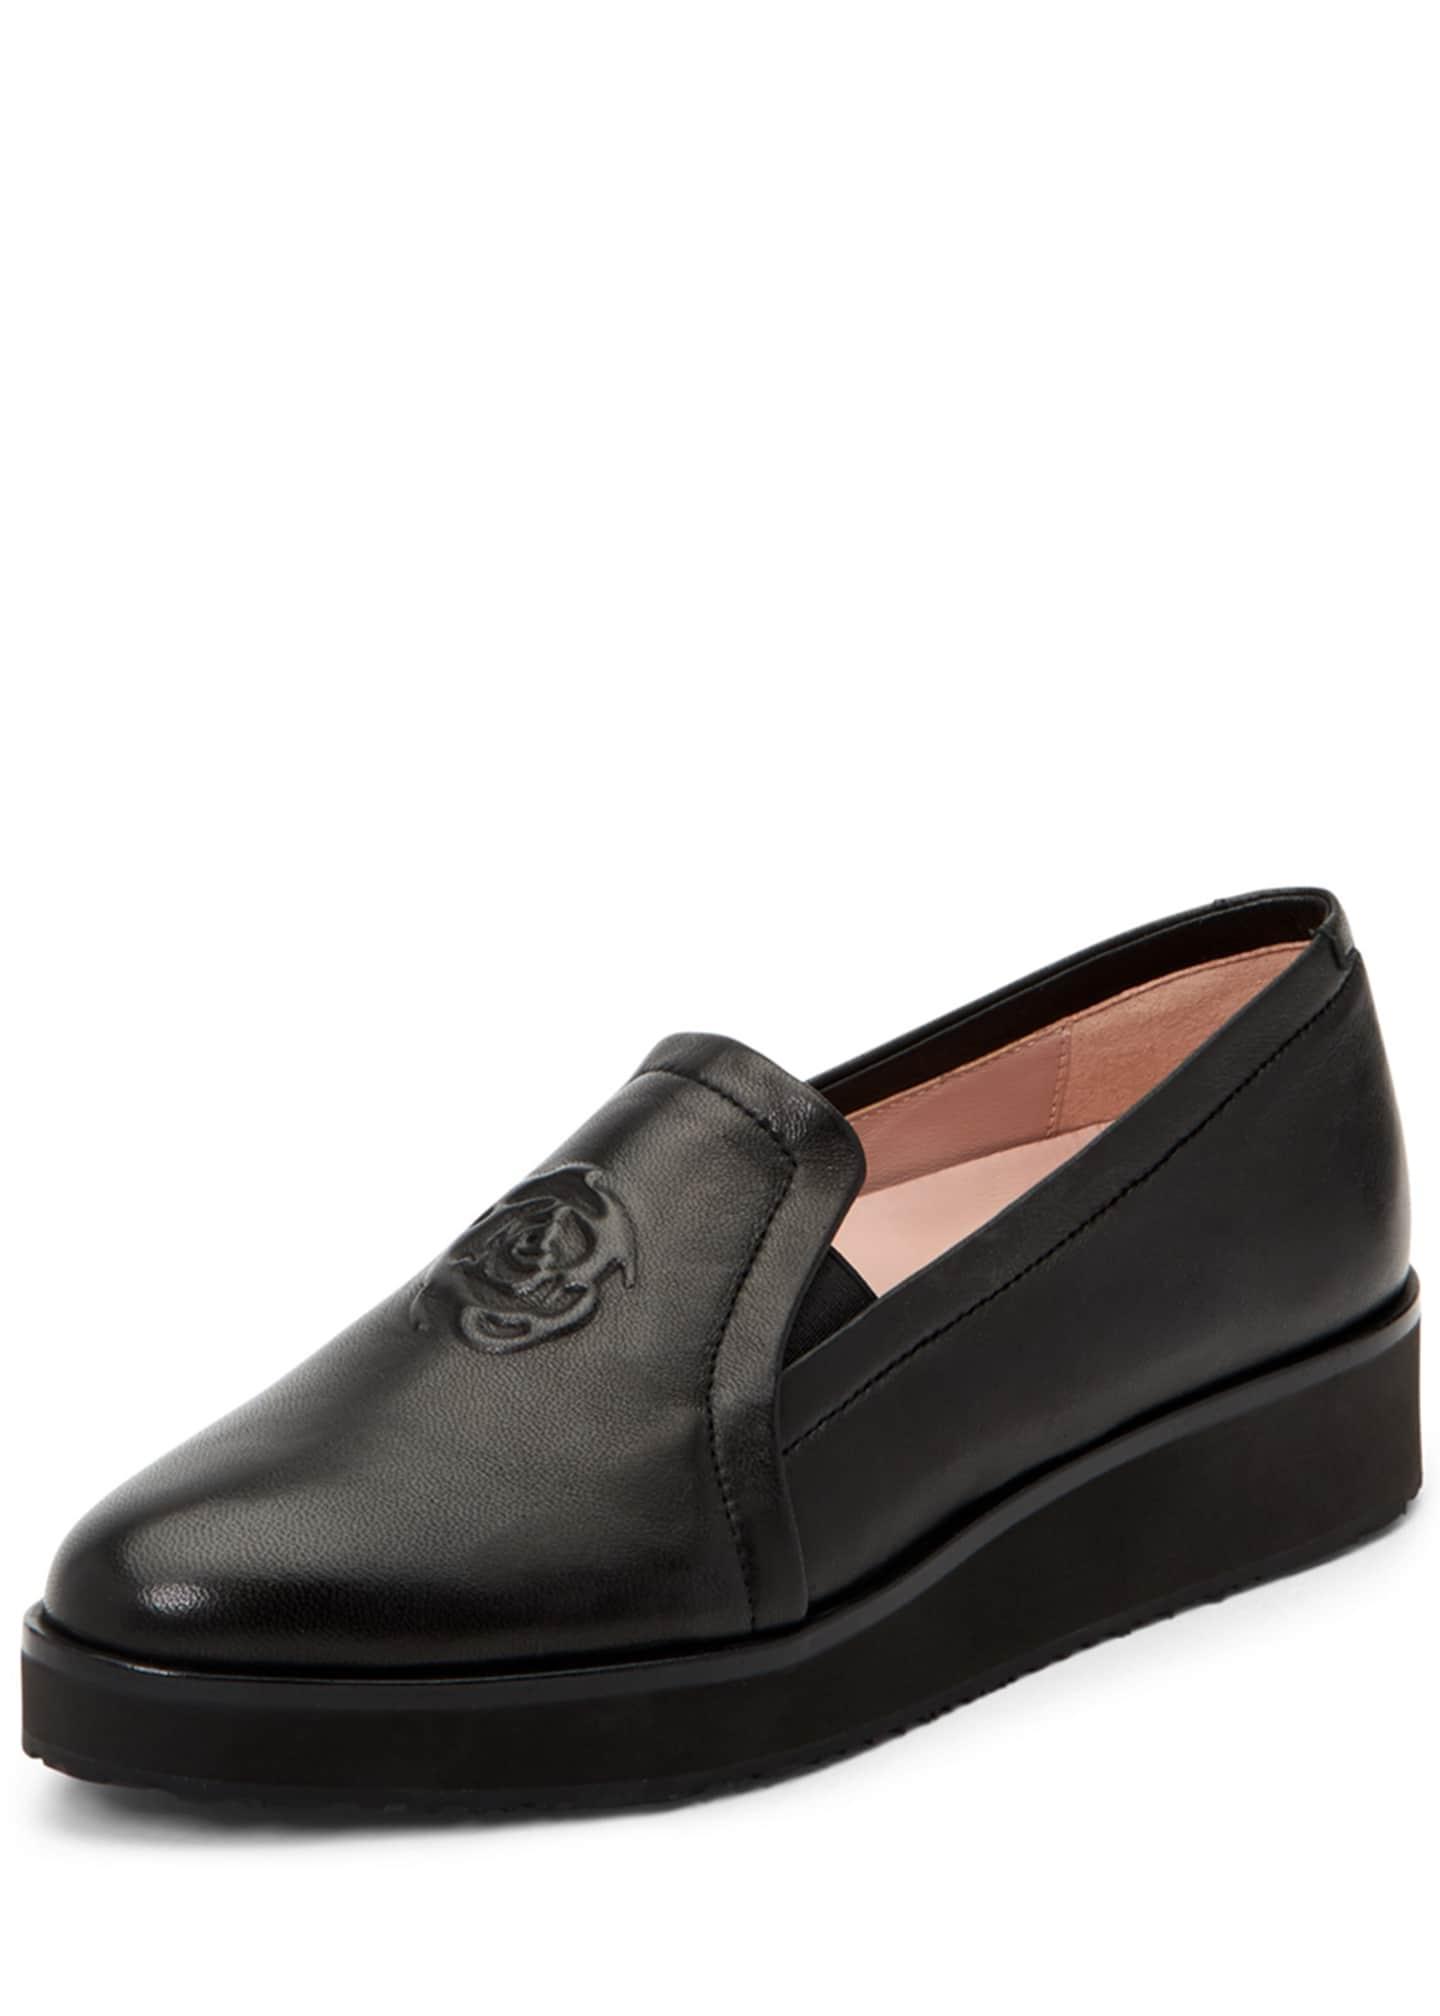 Taryn Rose Collection Rafaella Embossed Low-Platform Loafers